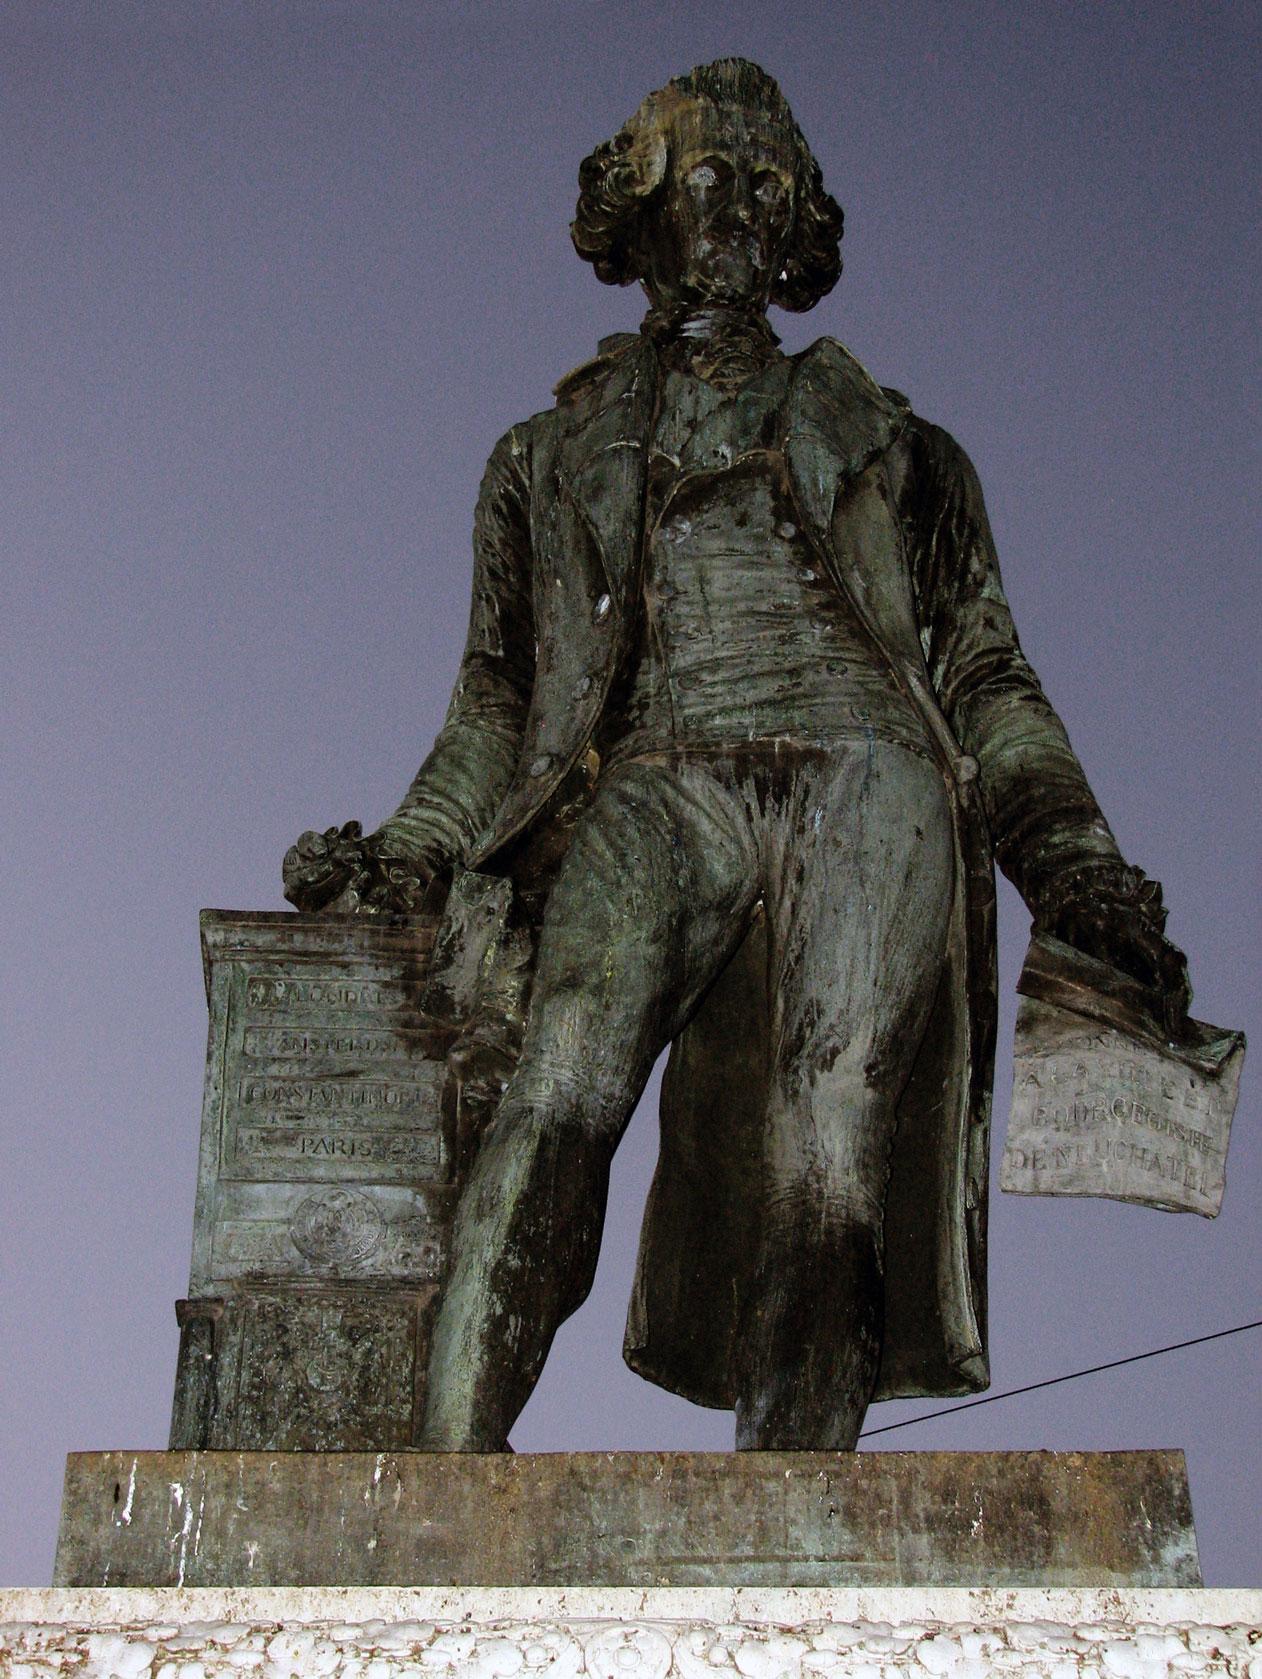 Statue de David de Pury, Neuchâtel